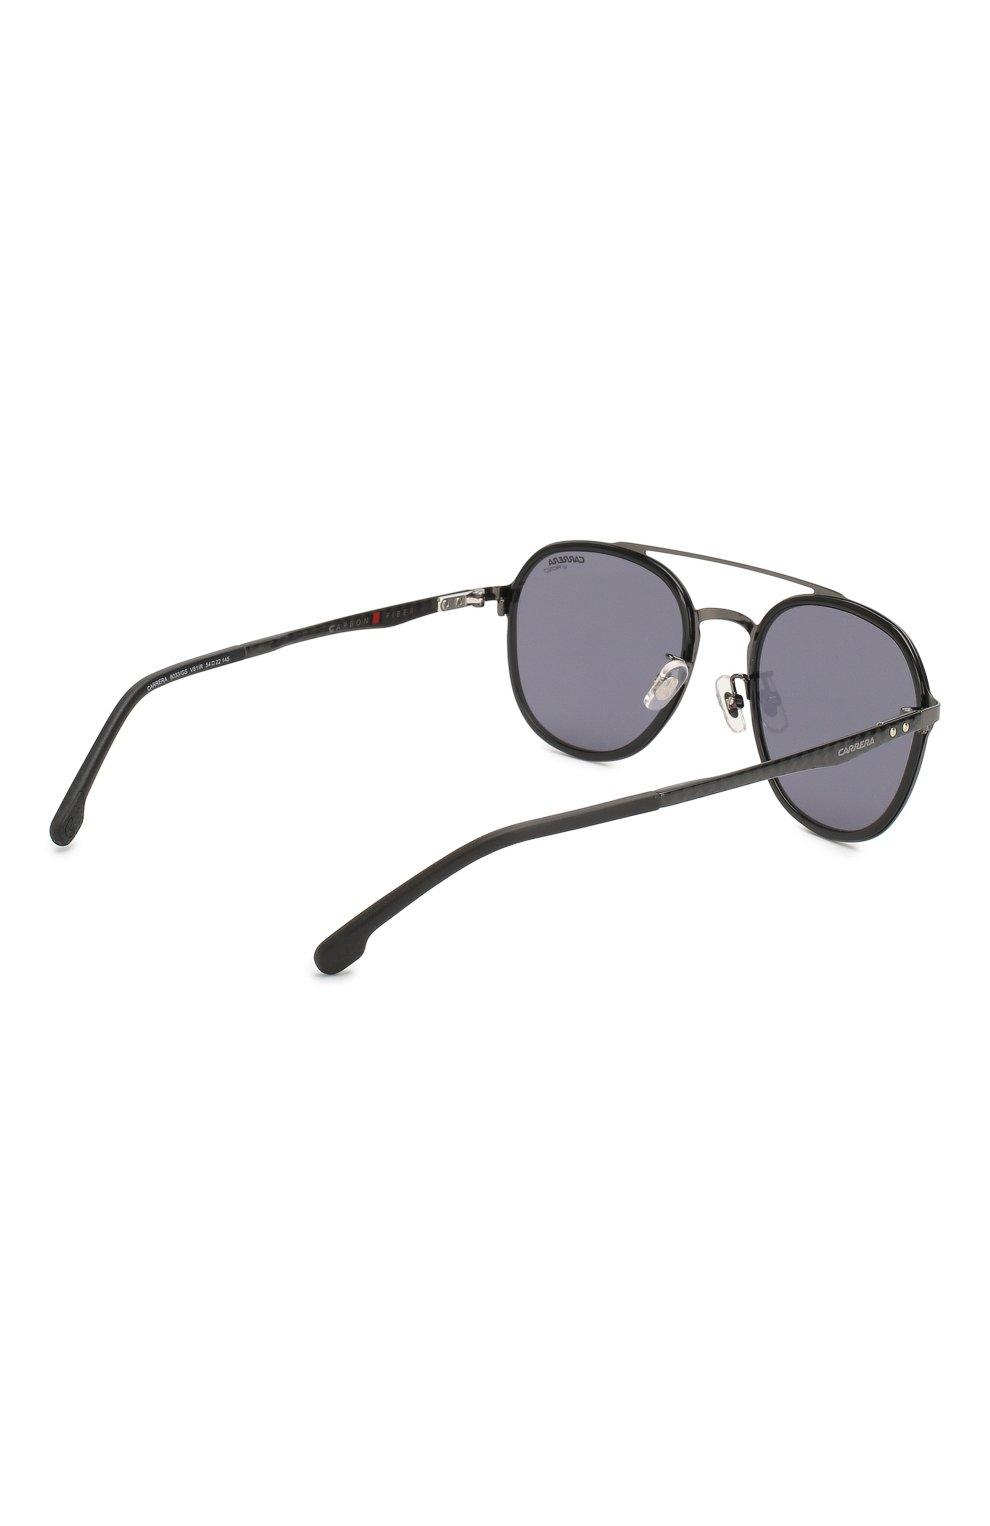 Женские солнцезащитные очки CARRERA темно-серого цвета, арт. CARRERA 8033/G V81 | Фото 5